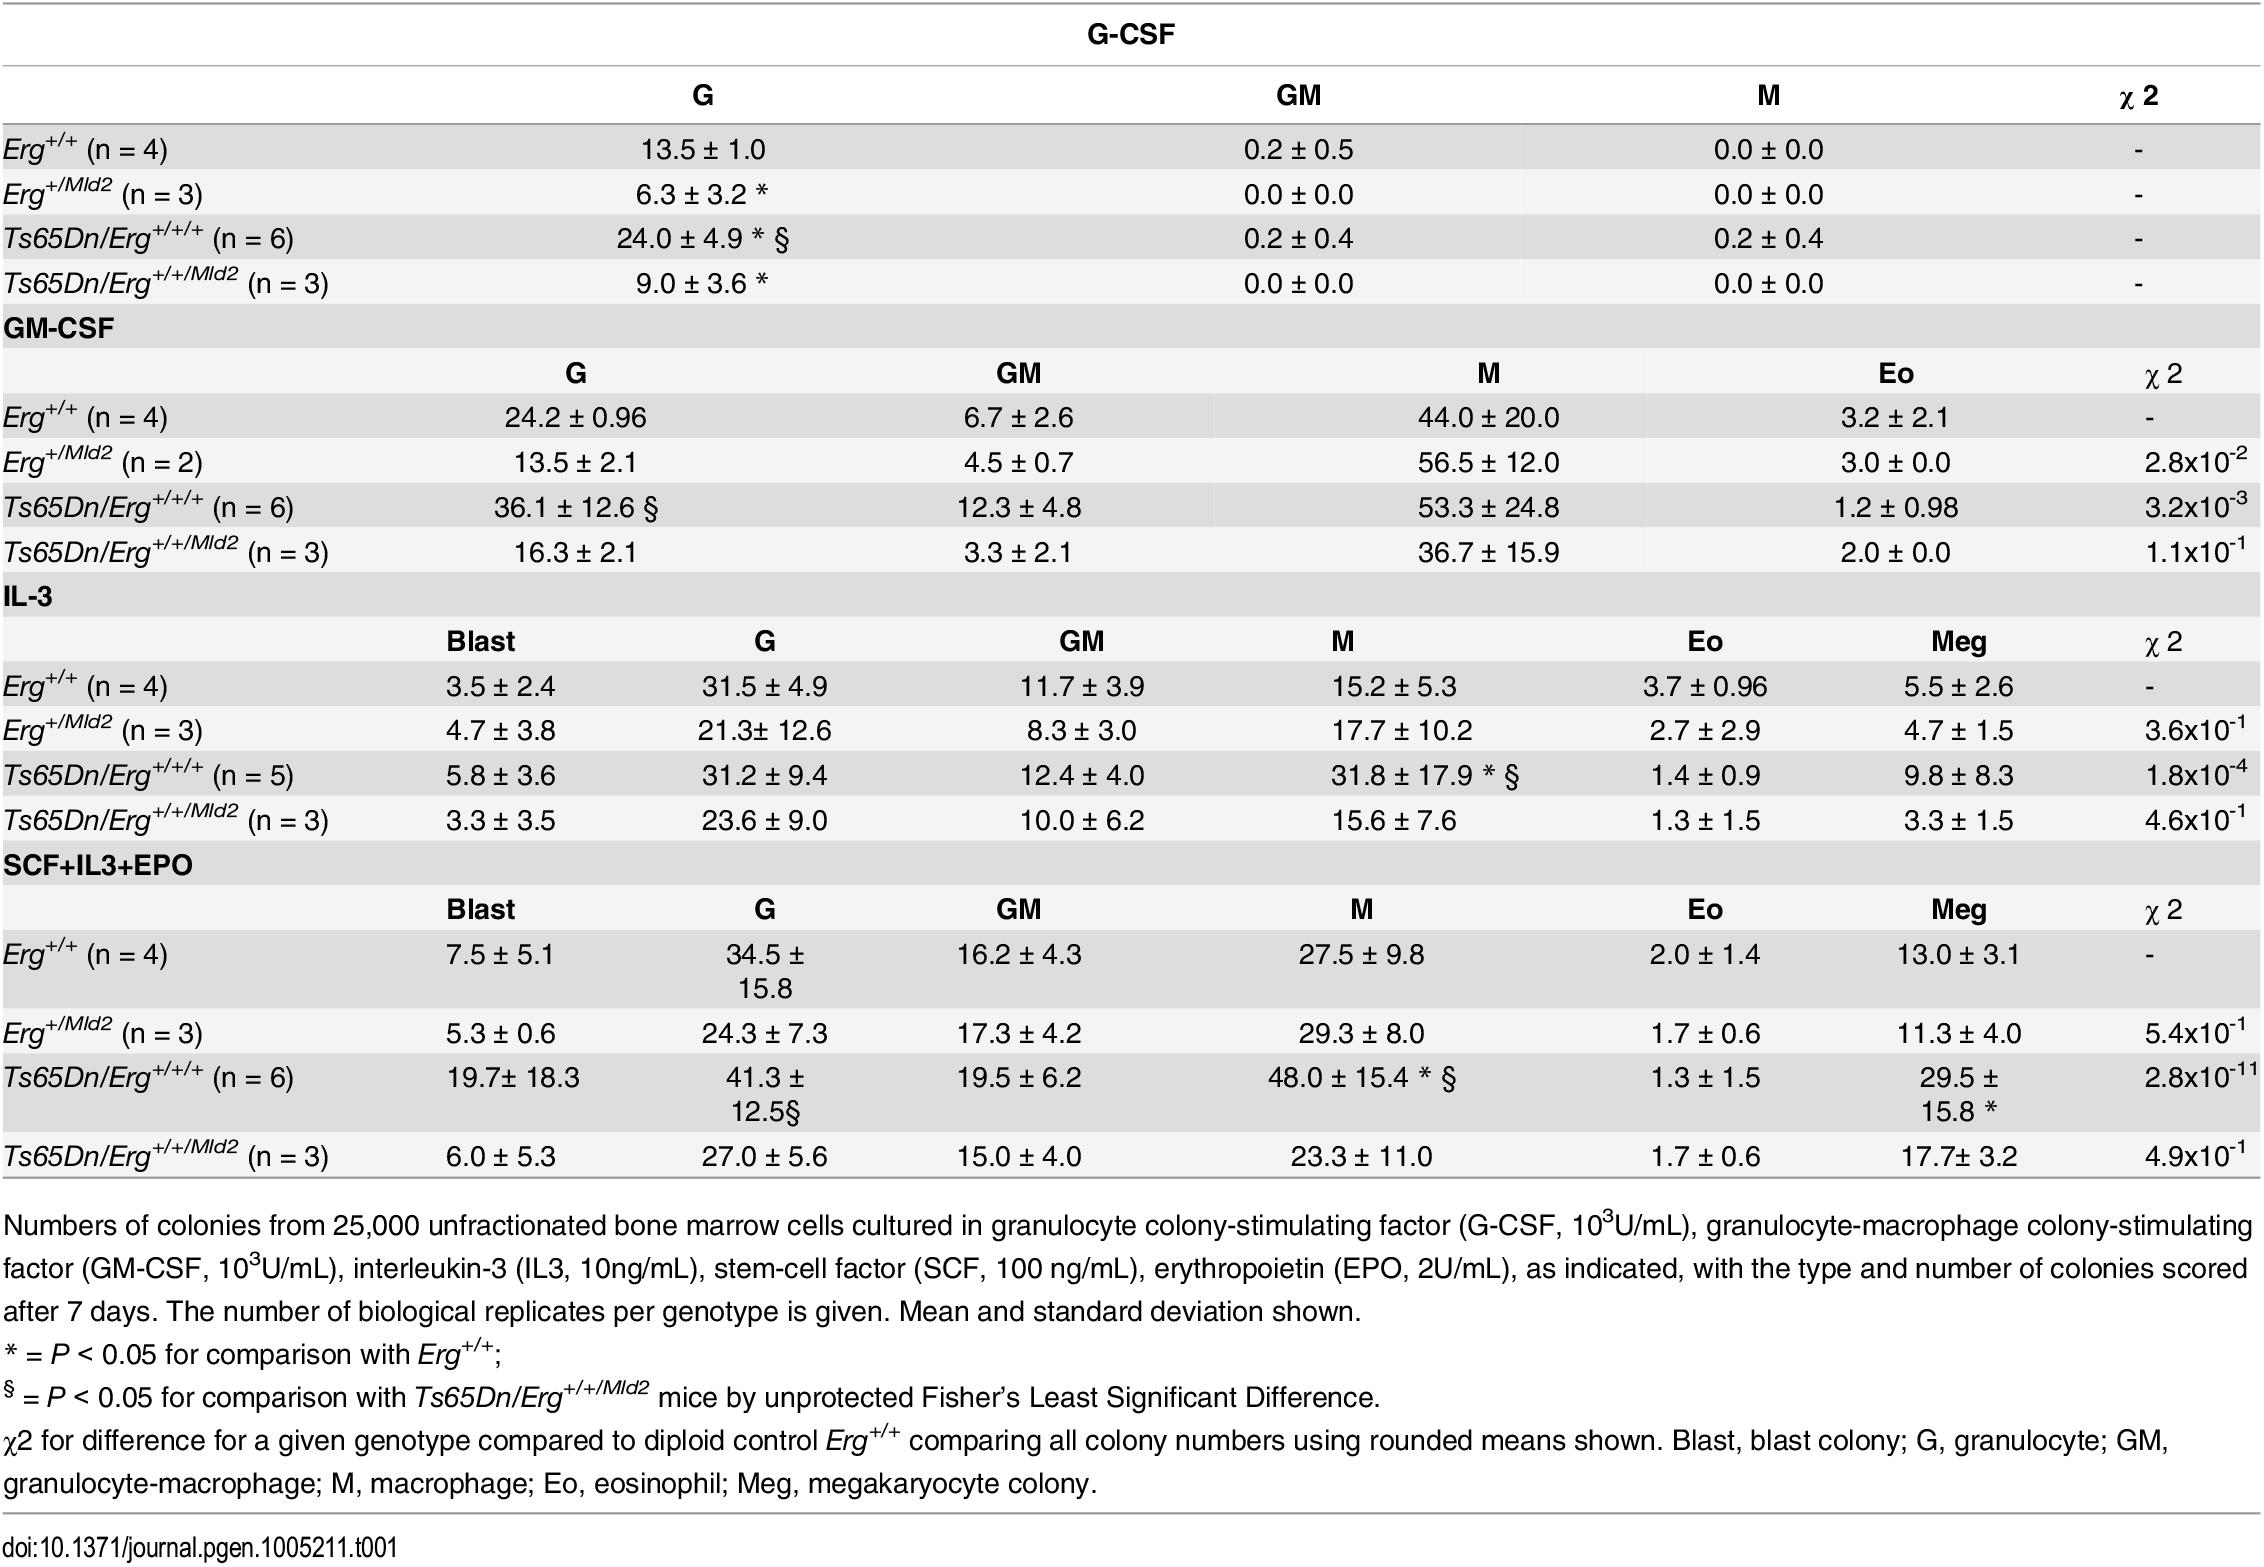 Hematopoietic progenitor abnormalities in Ts65Dn(17<sup>16</sup>) bone marrow by semi-solid agar clonogenic colony assays.